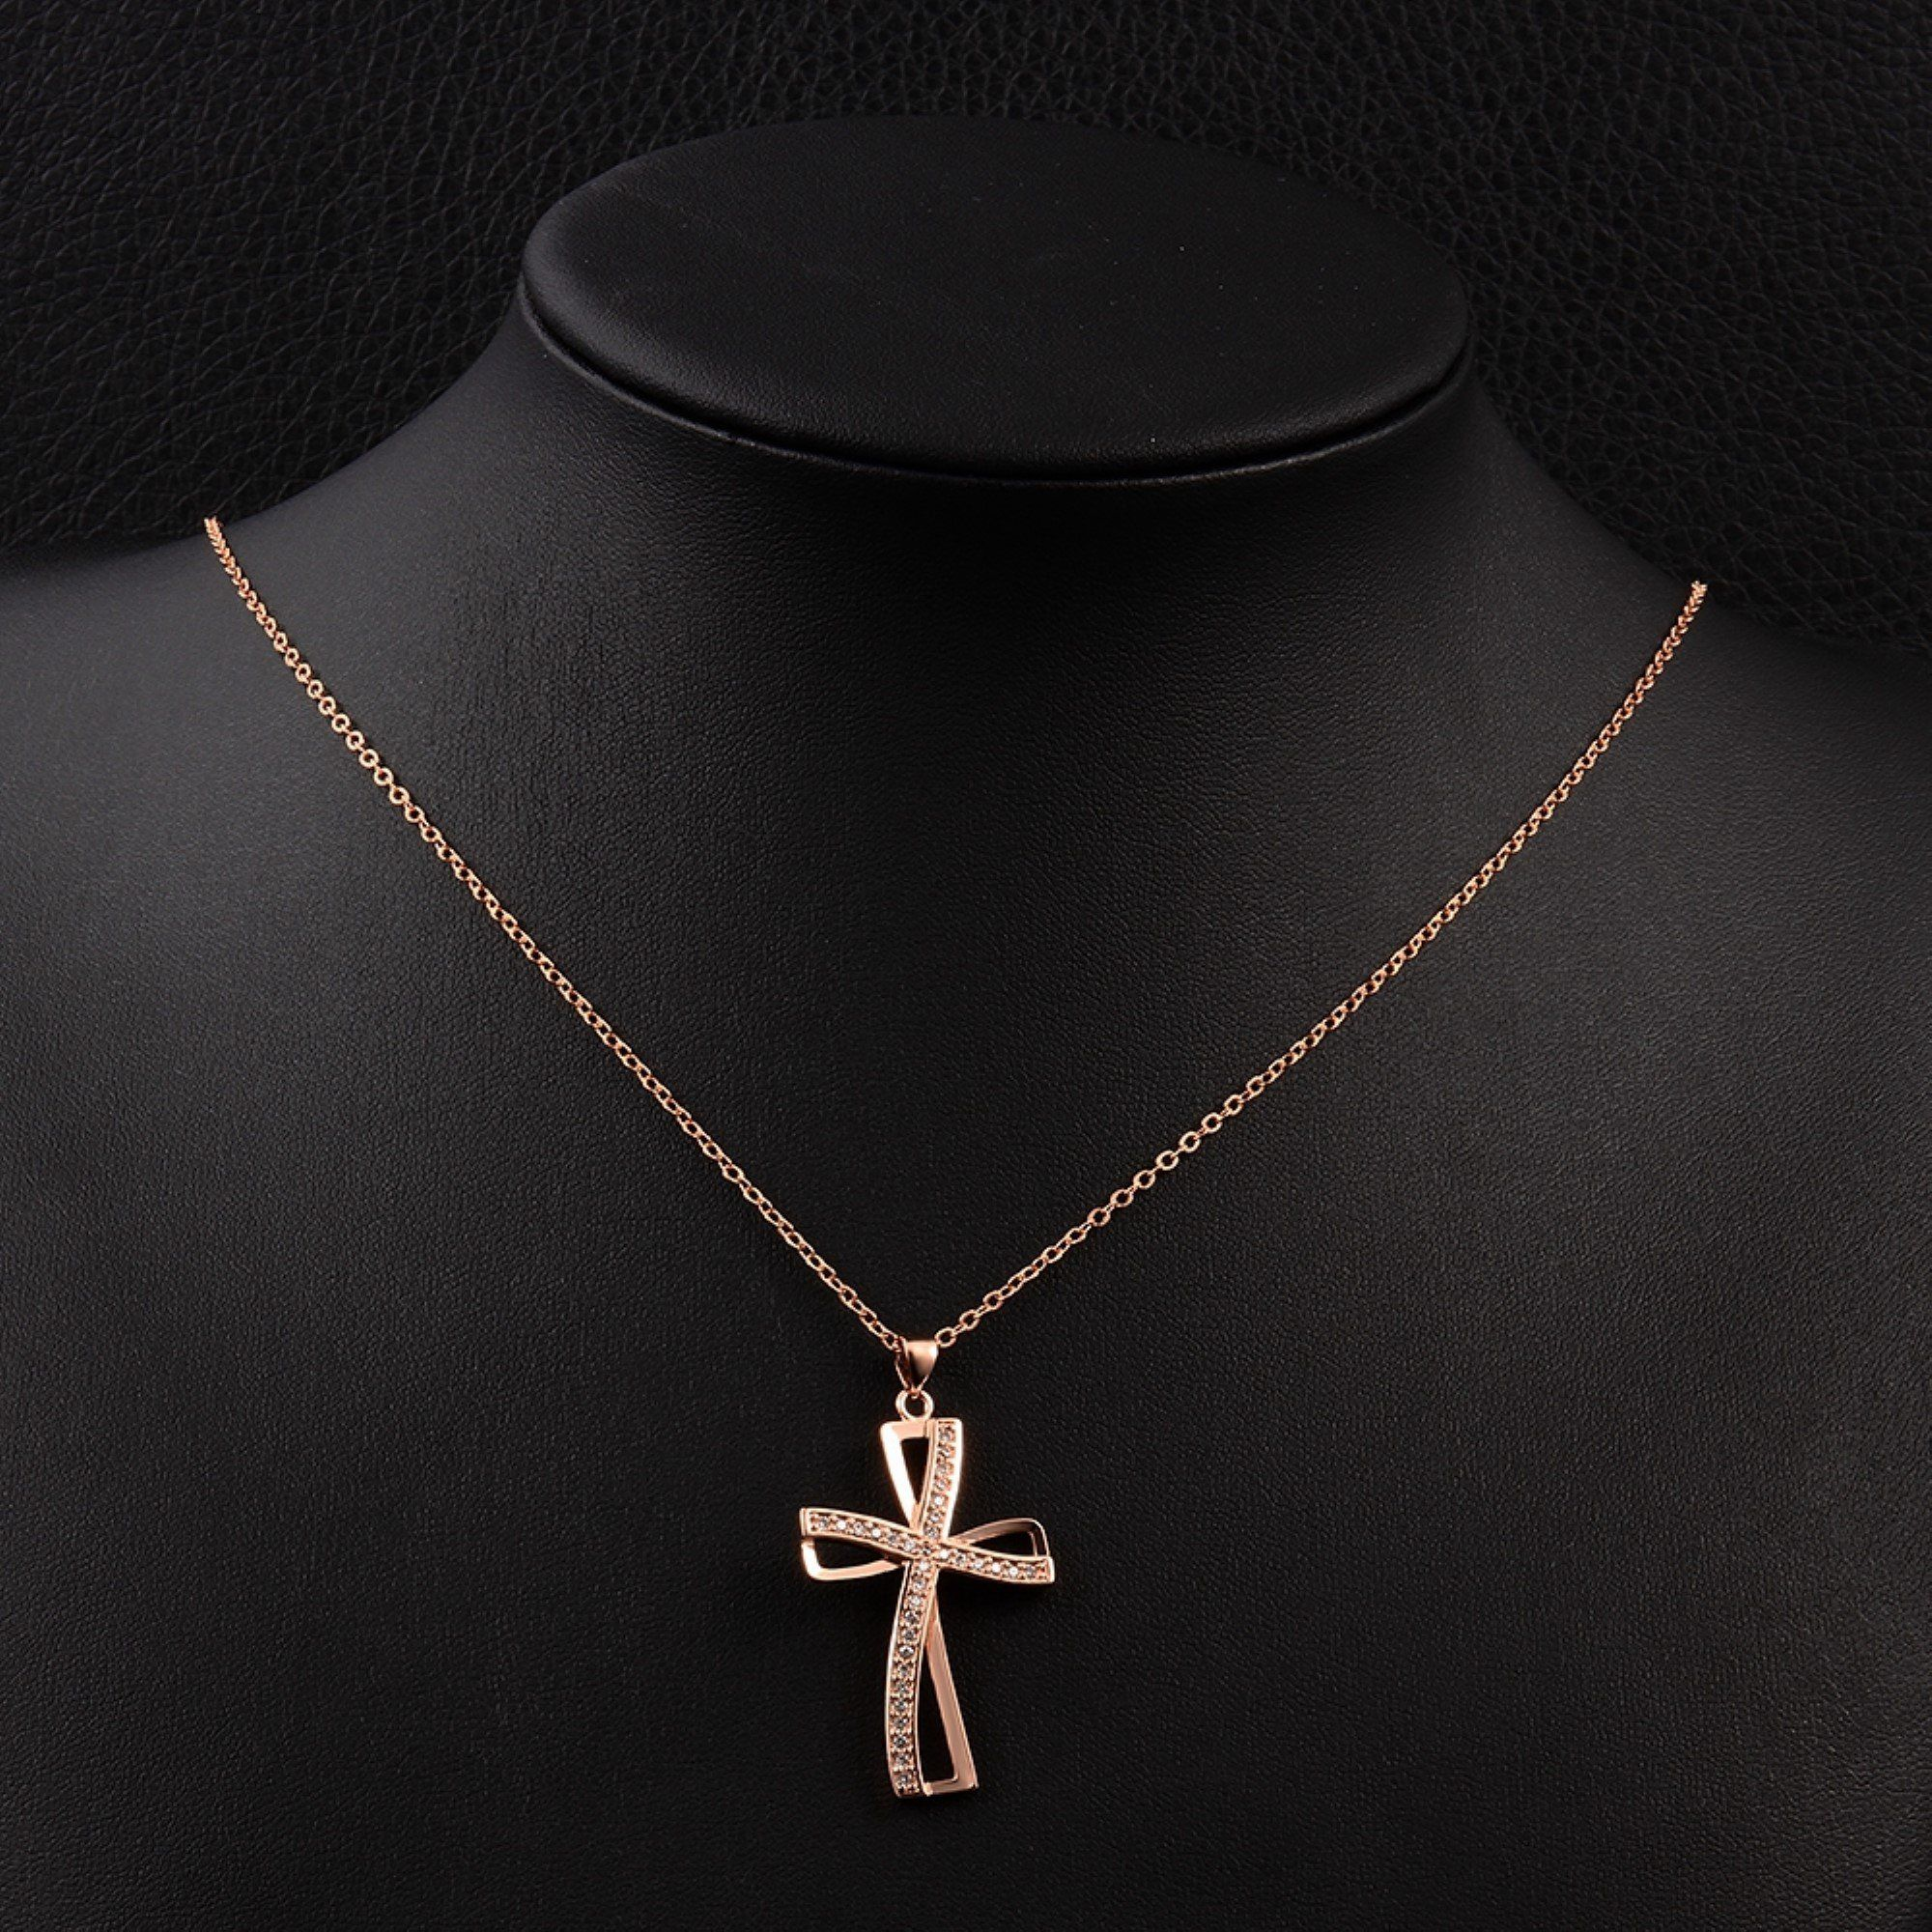 CS-DB Jewelry Silver Cross Chain Charm Pendants Necklaces